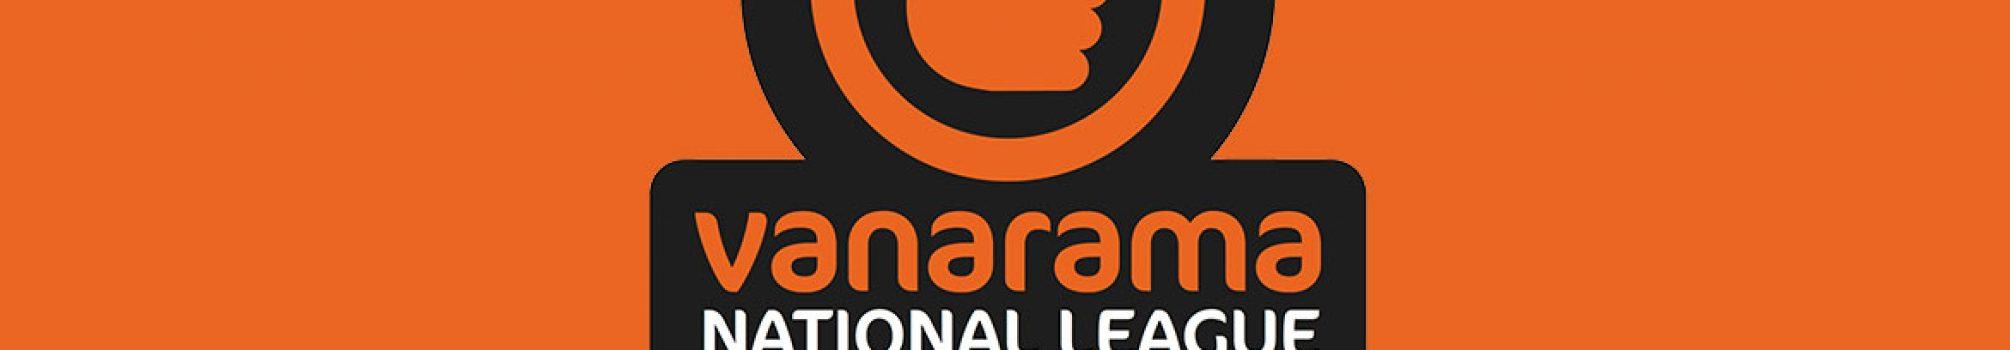 vanarama-national-league